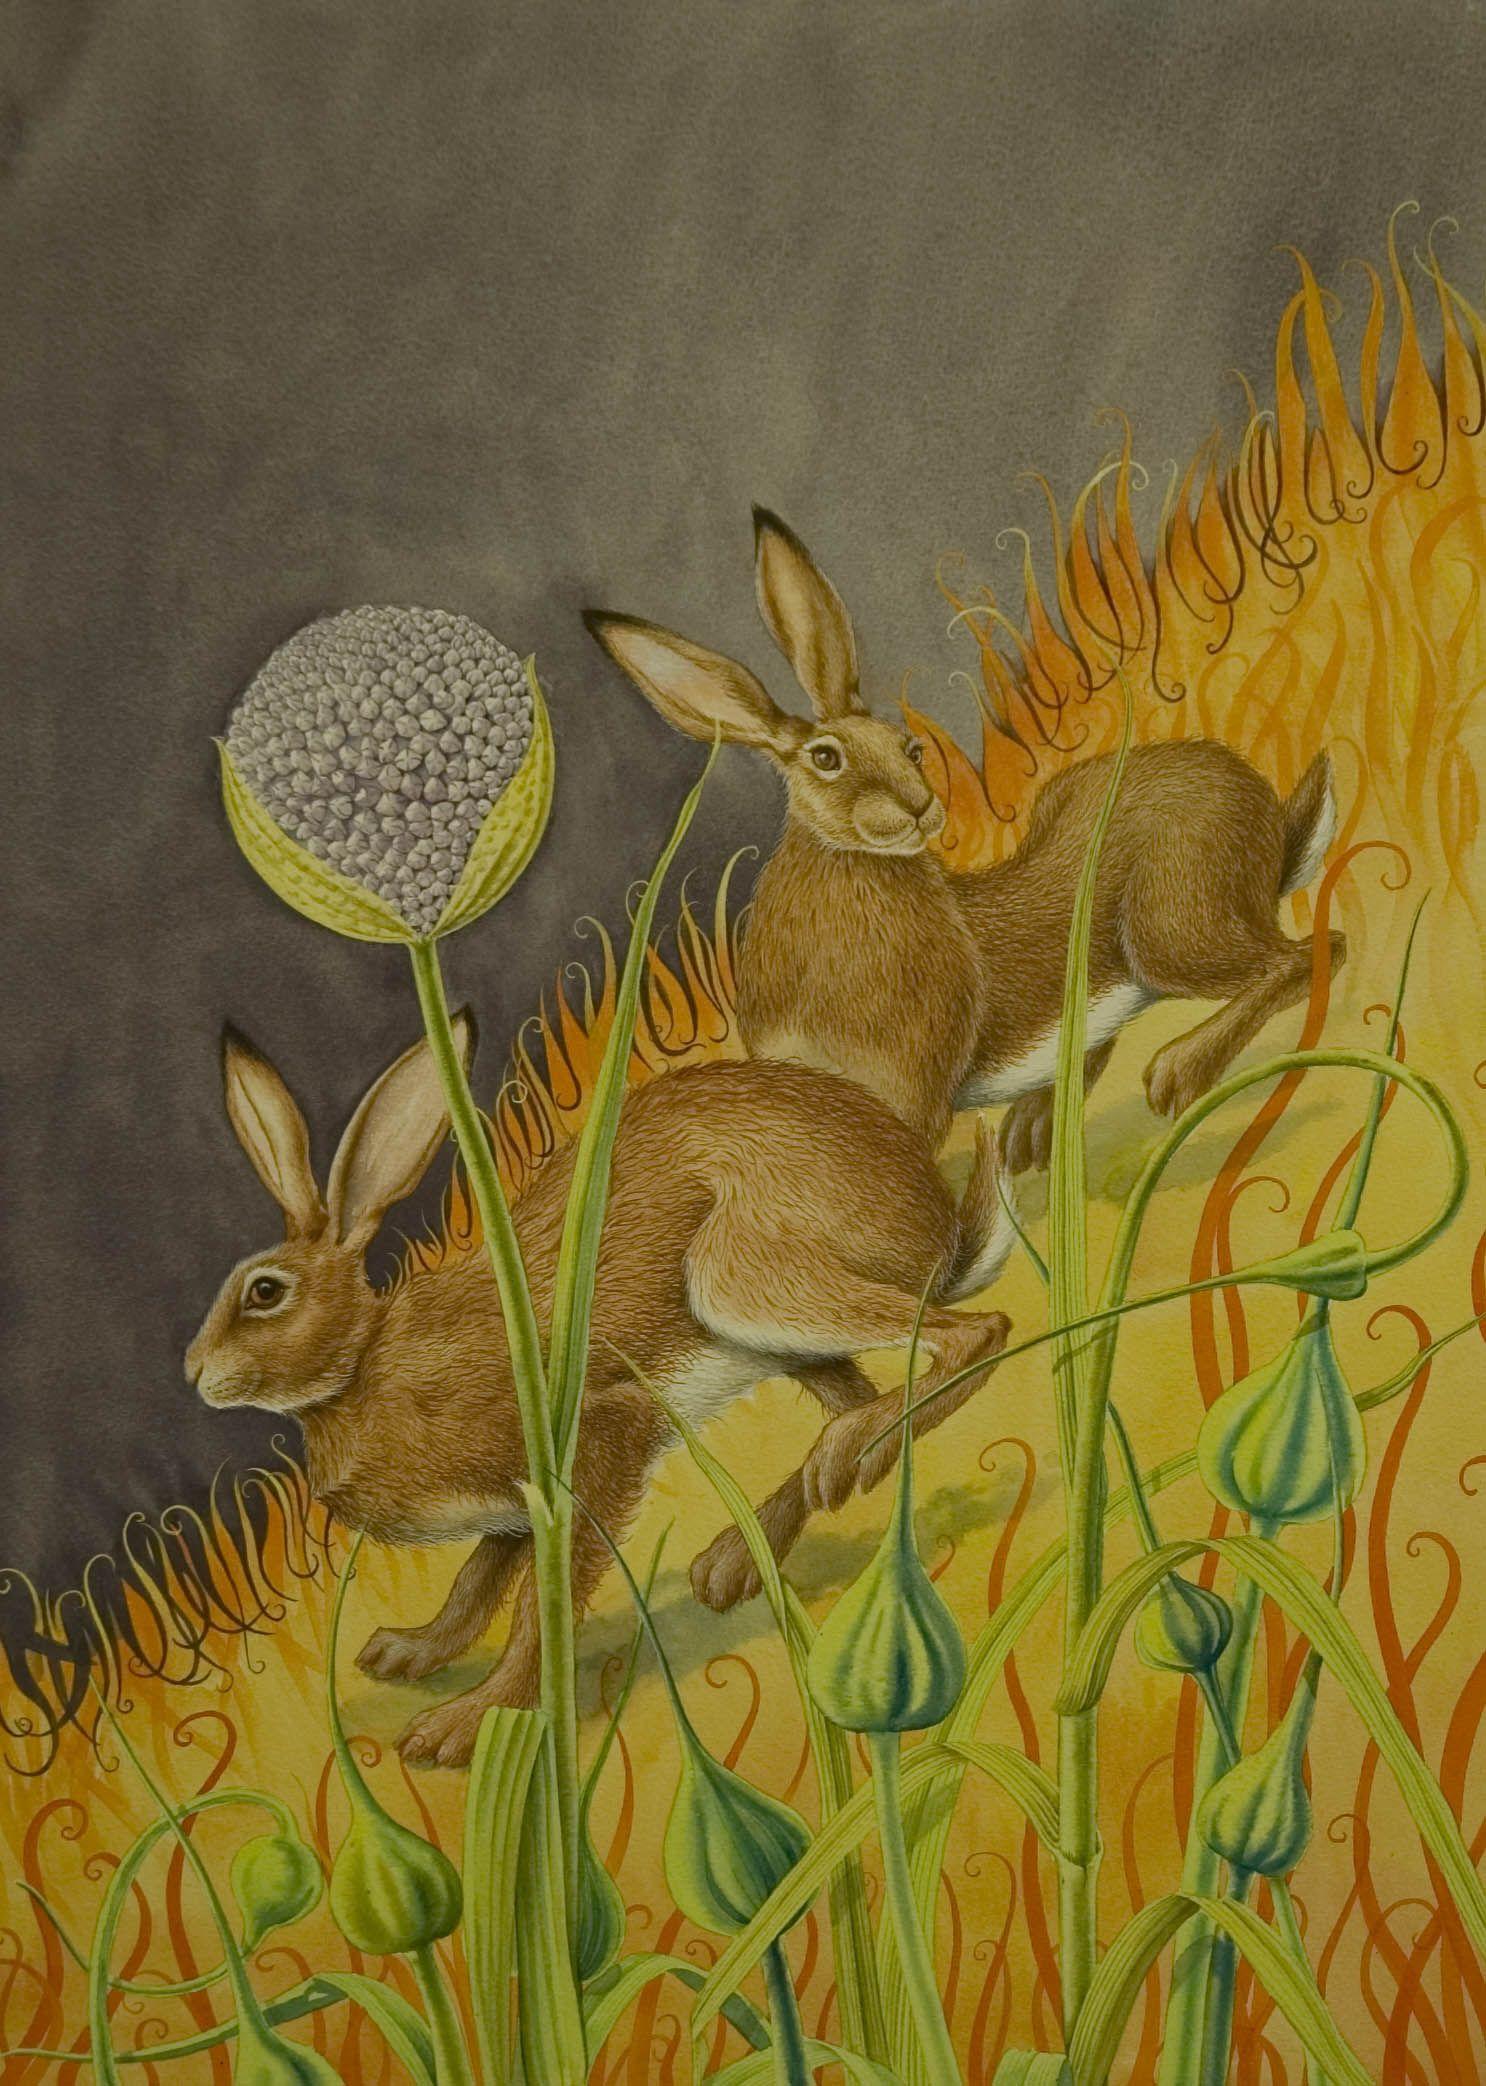 'Flaming June' - Sandra Pond